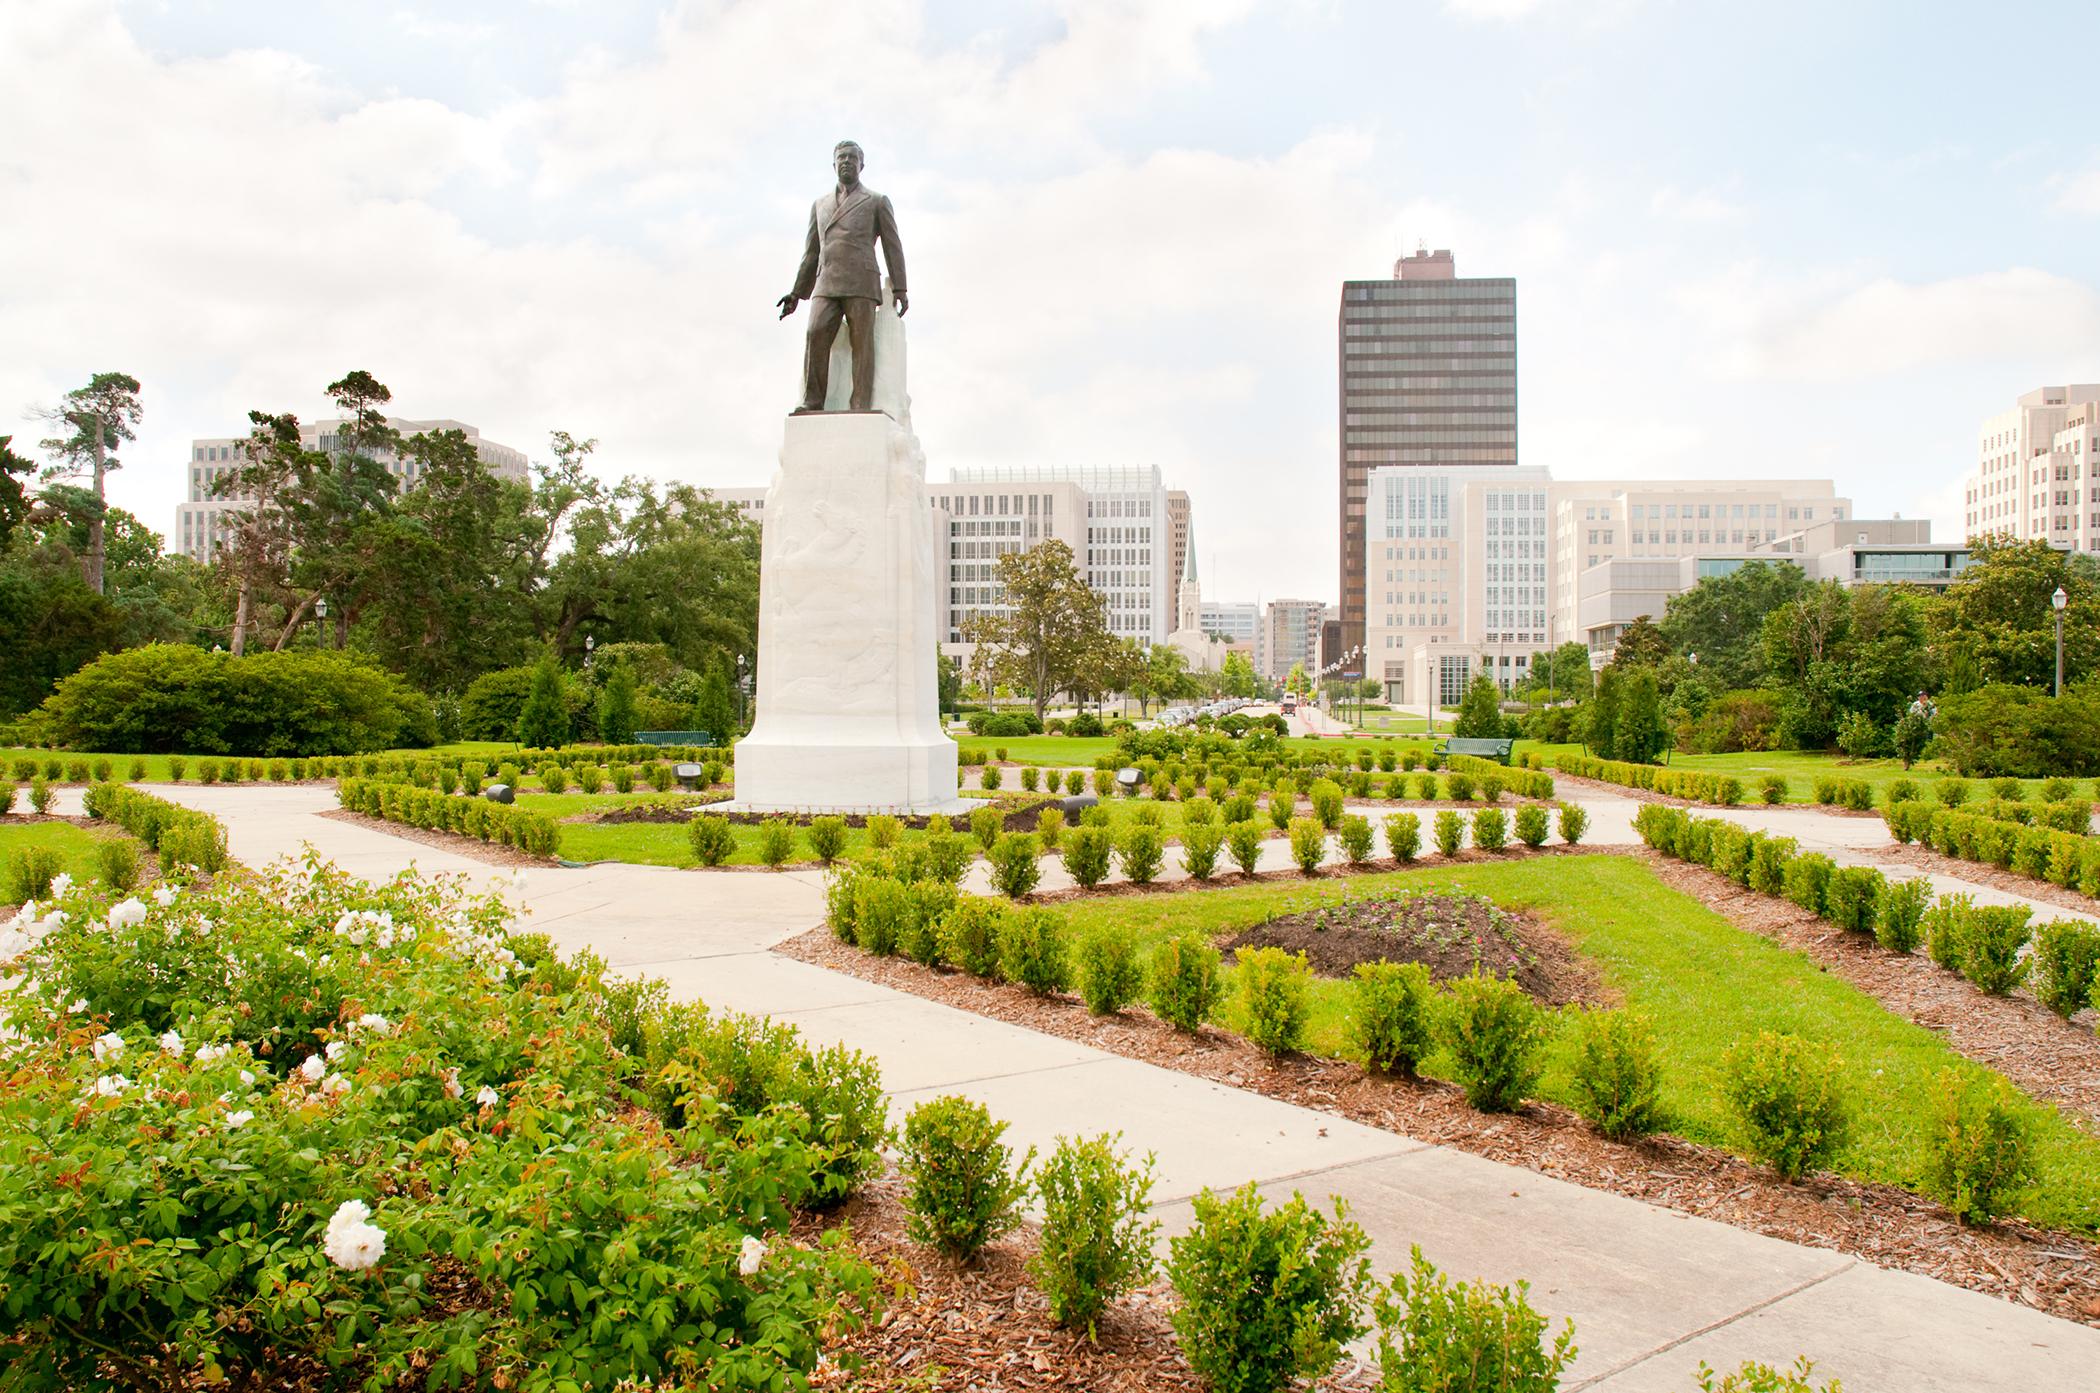 Huey Long statue and Baton Rouge skyline